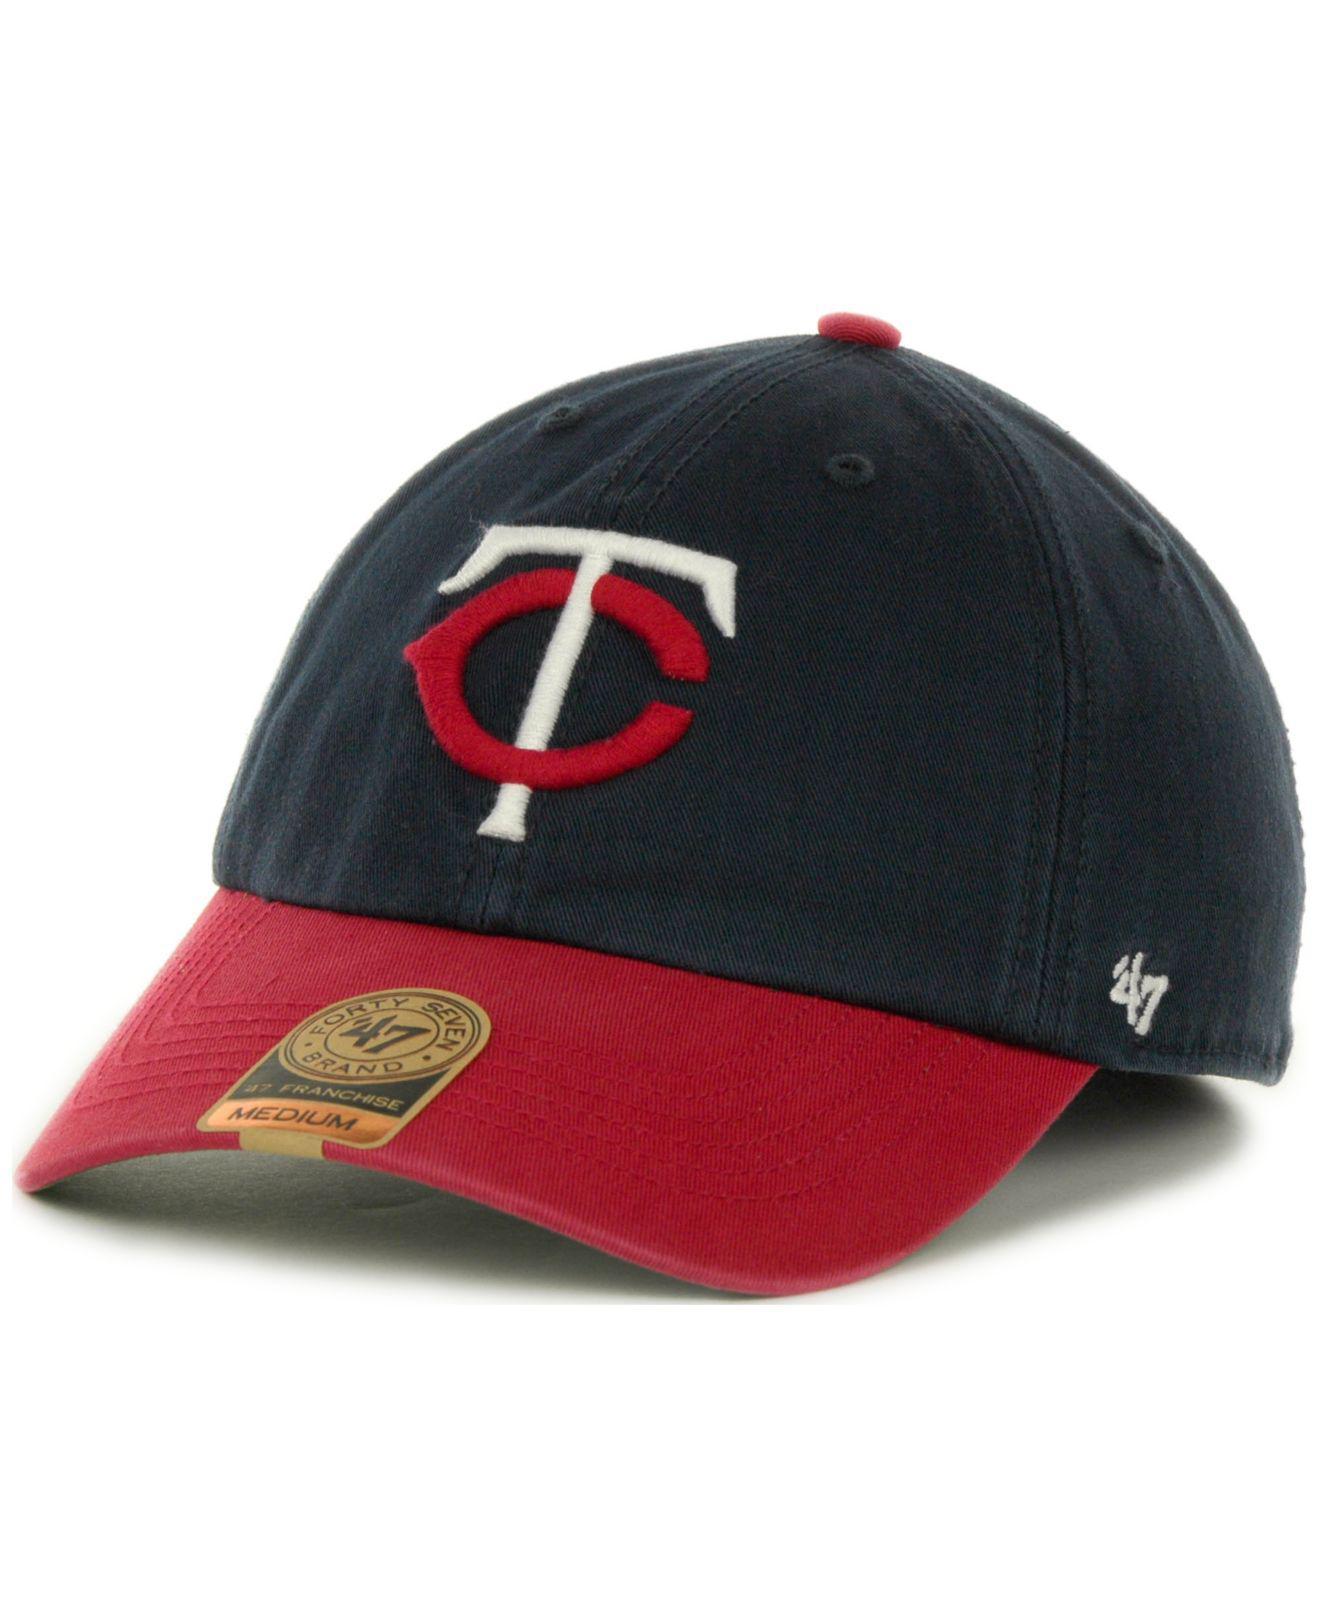 online retailer 1540c 859e2 ... italy lyst 47 brand minnesota twins 47 franchise cap for men 32104 20d9e